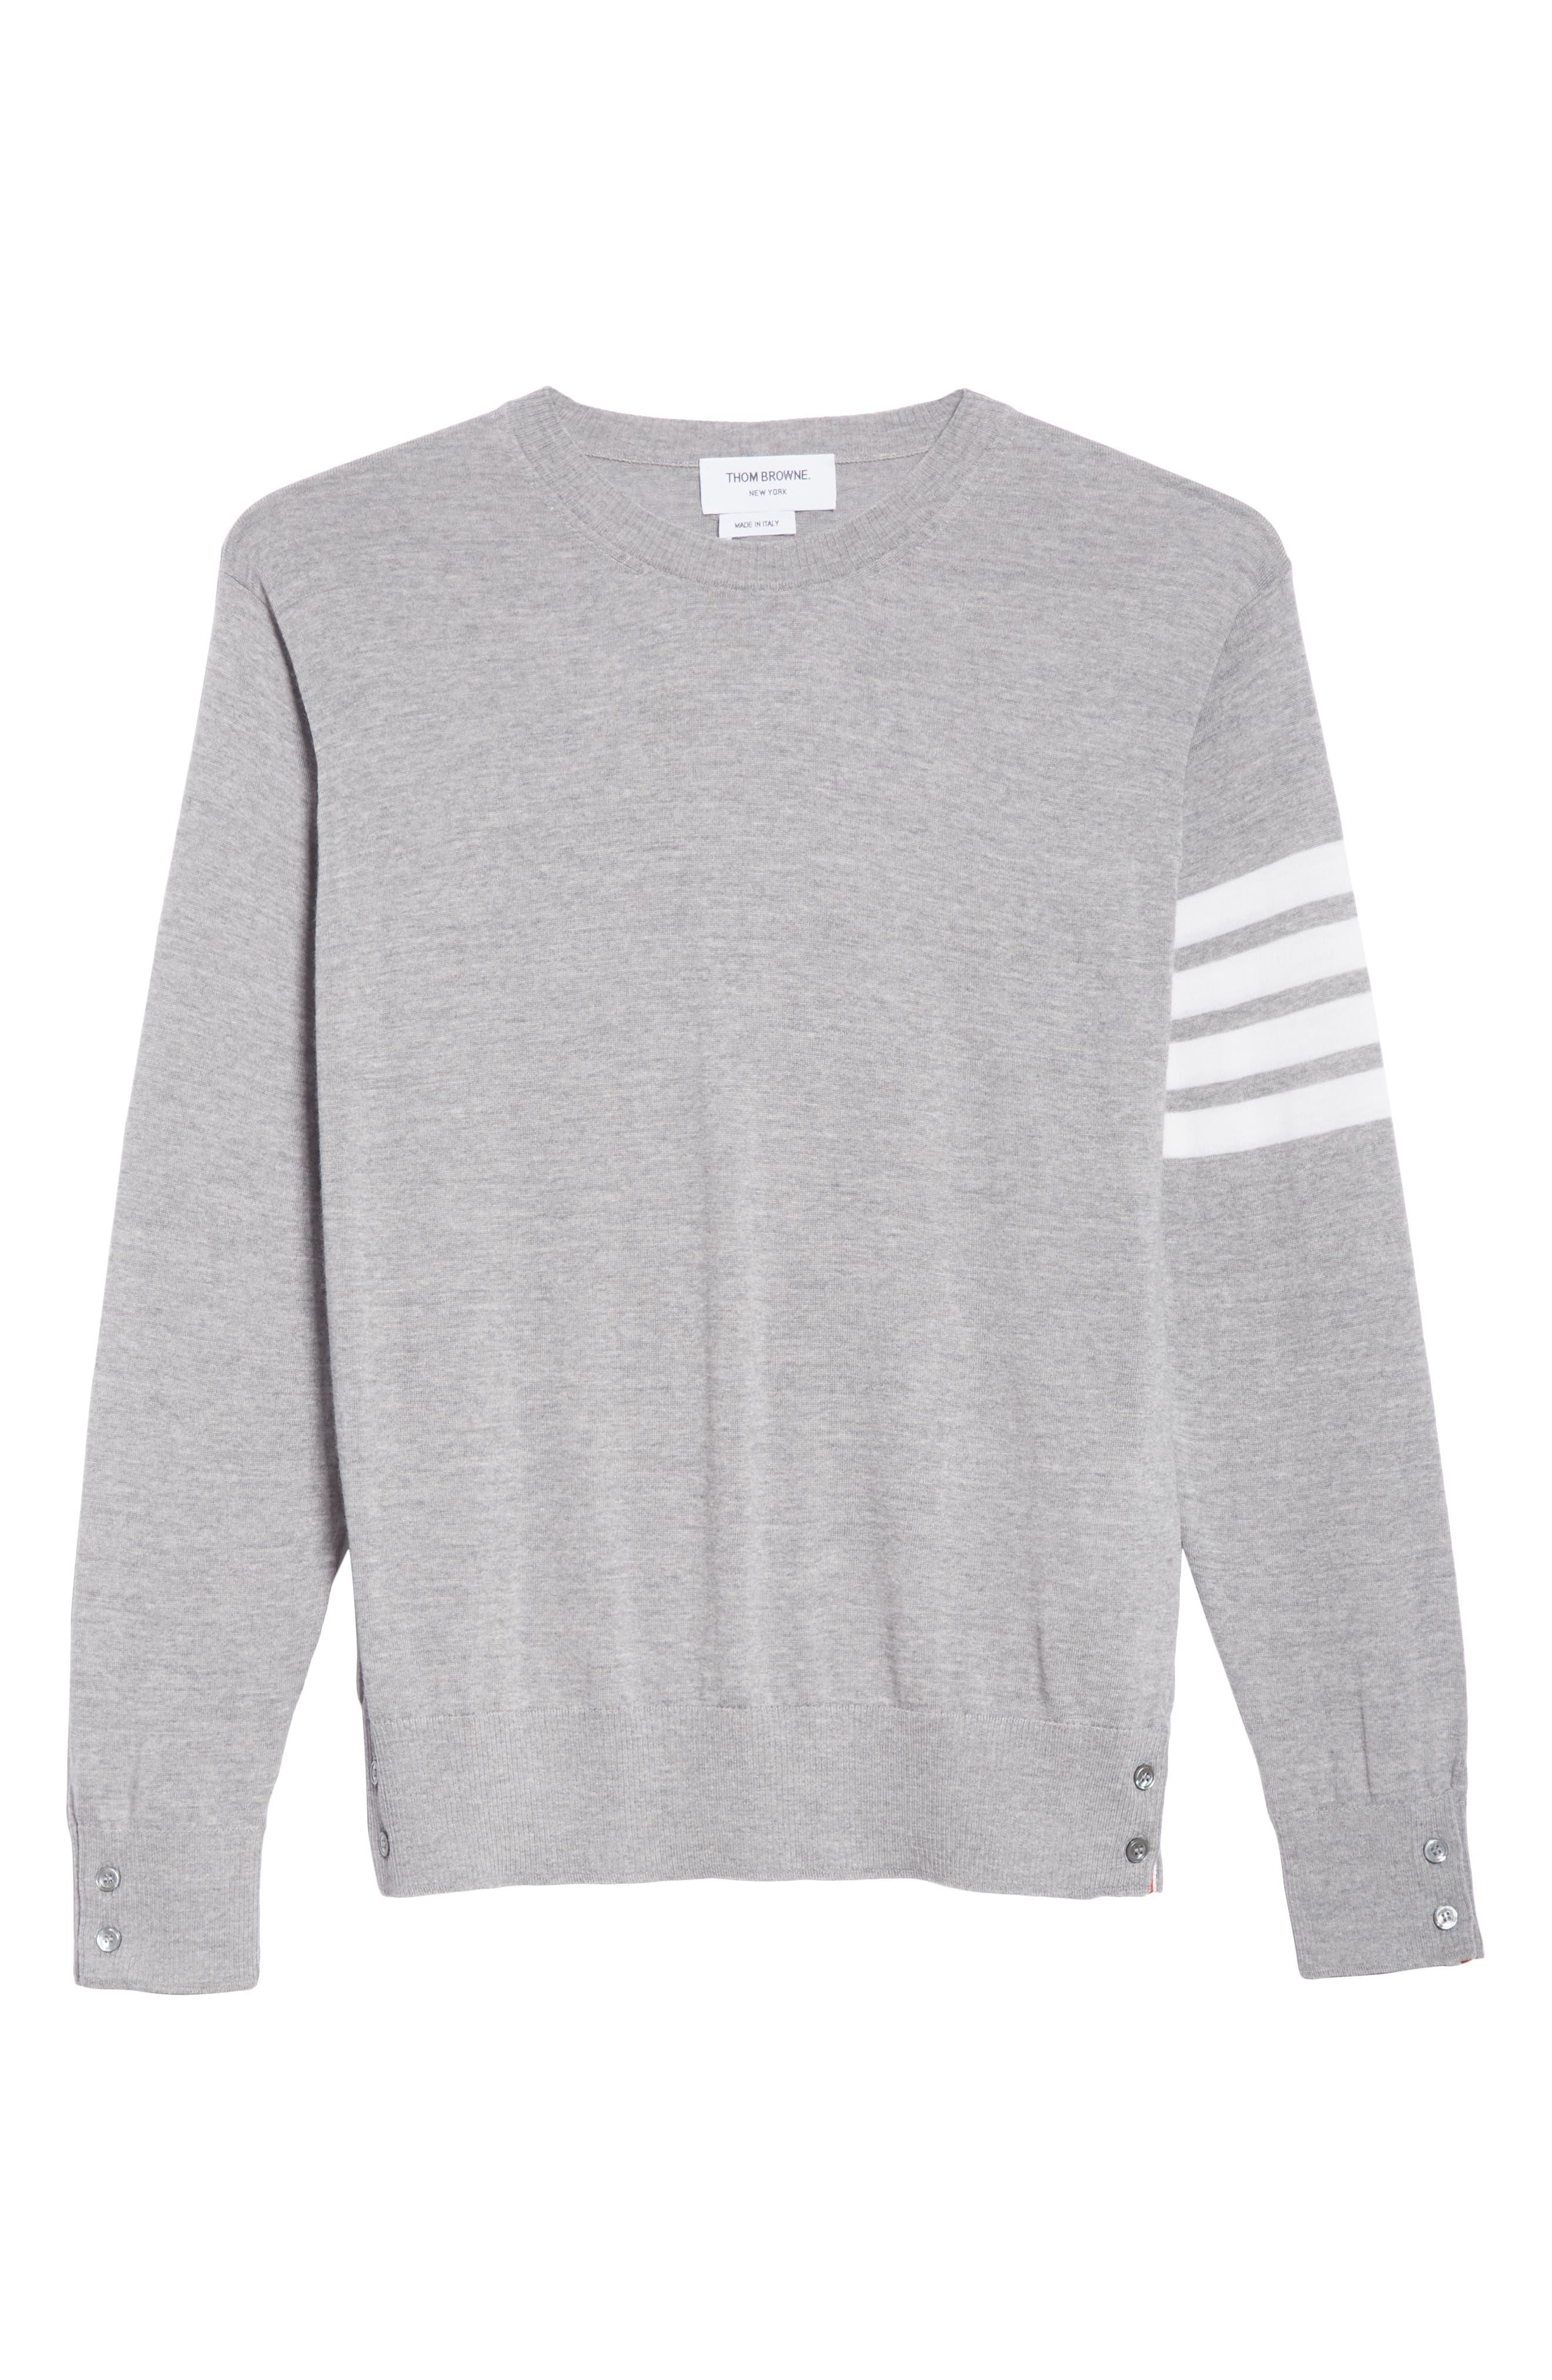 Merino Wool Pullover,                             Alternate thumbnail 6, color,                             LIGHT GREY